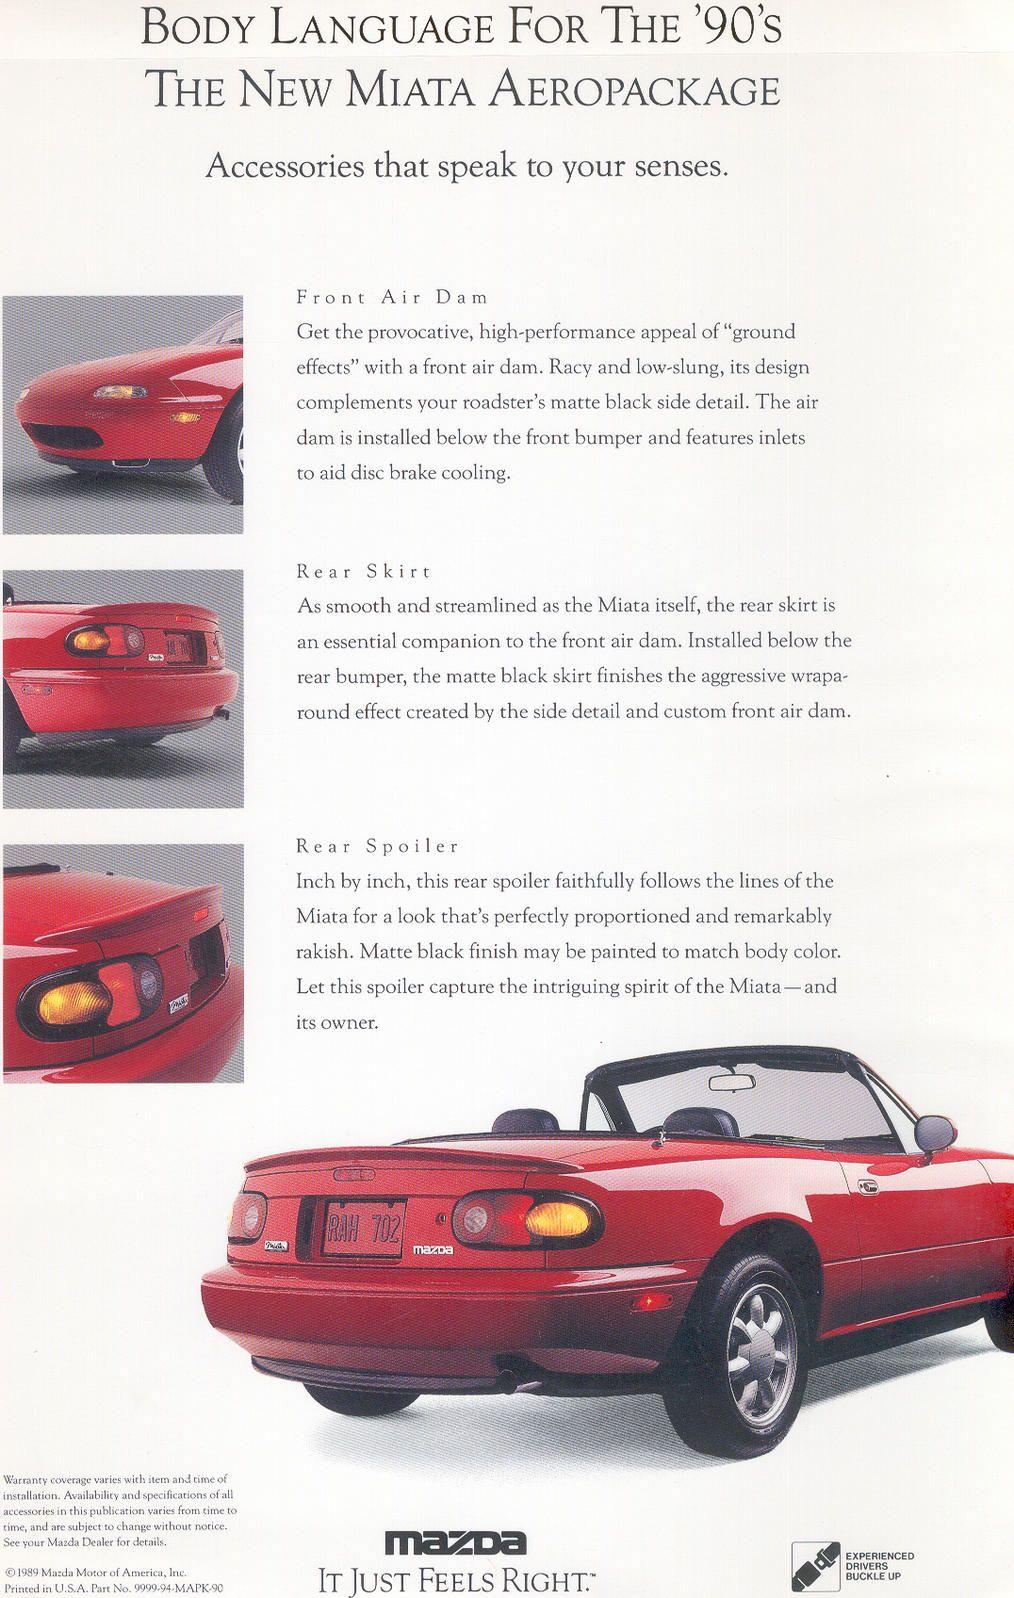 1990 Mazda Miata Na Oem Accessories Page Mazda Miata Mazda Mx5 Miata Miata